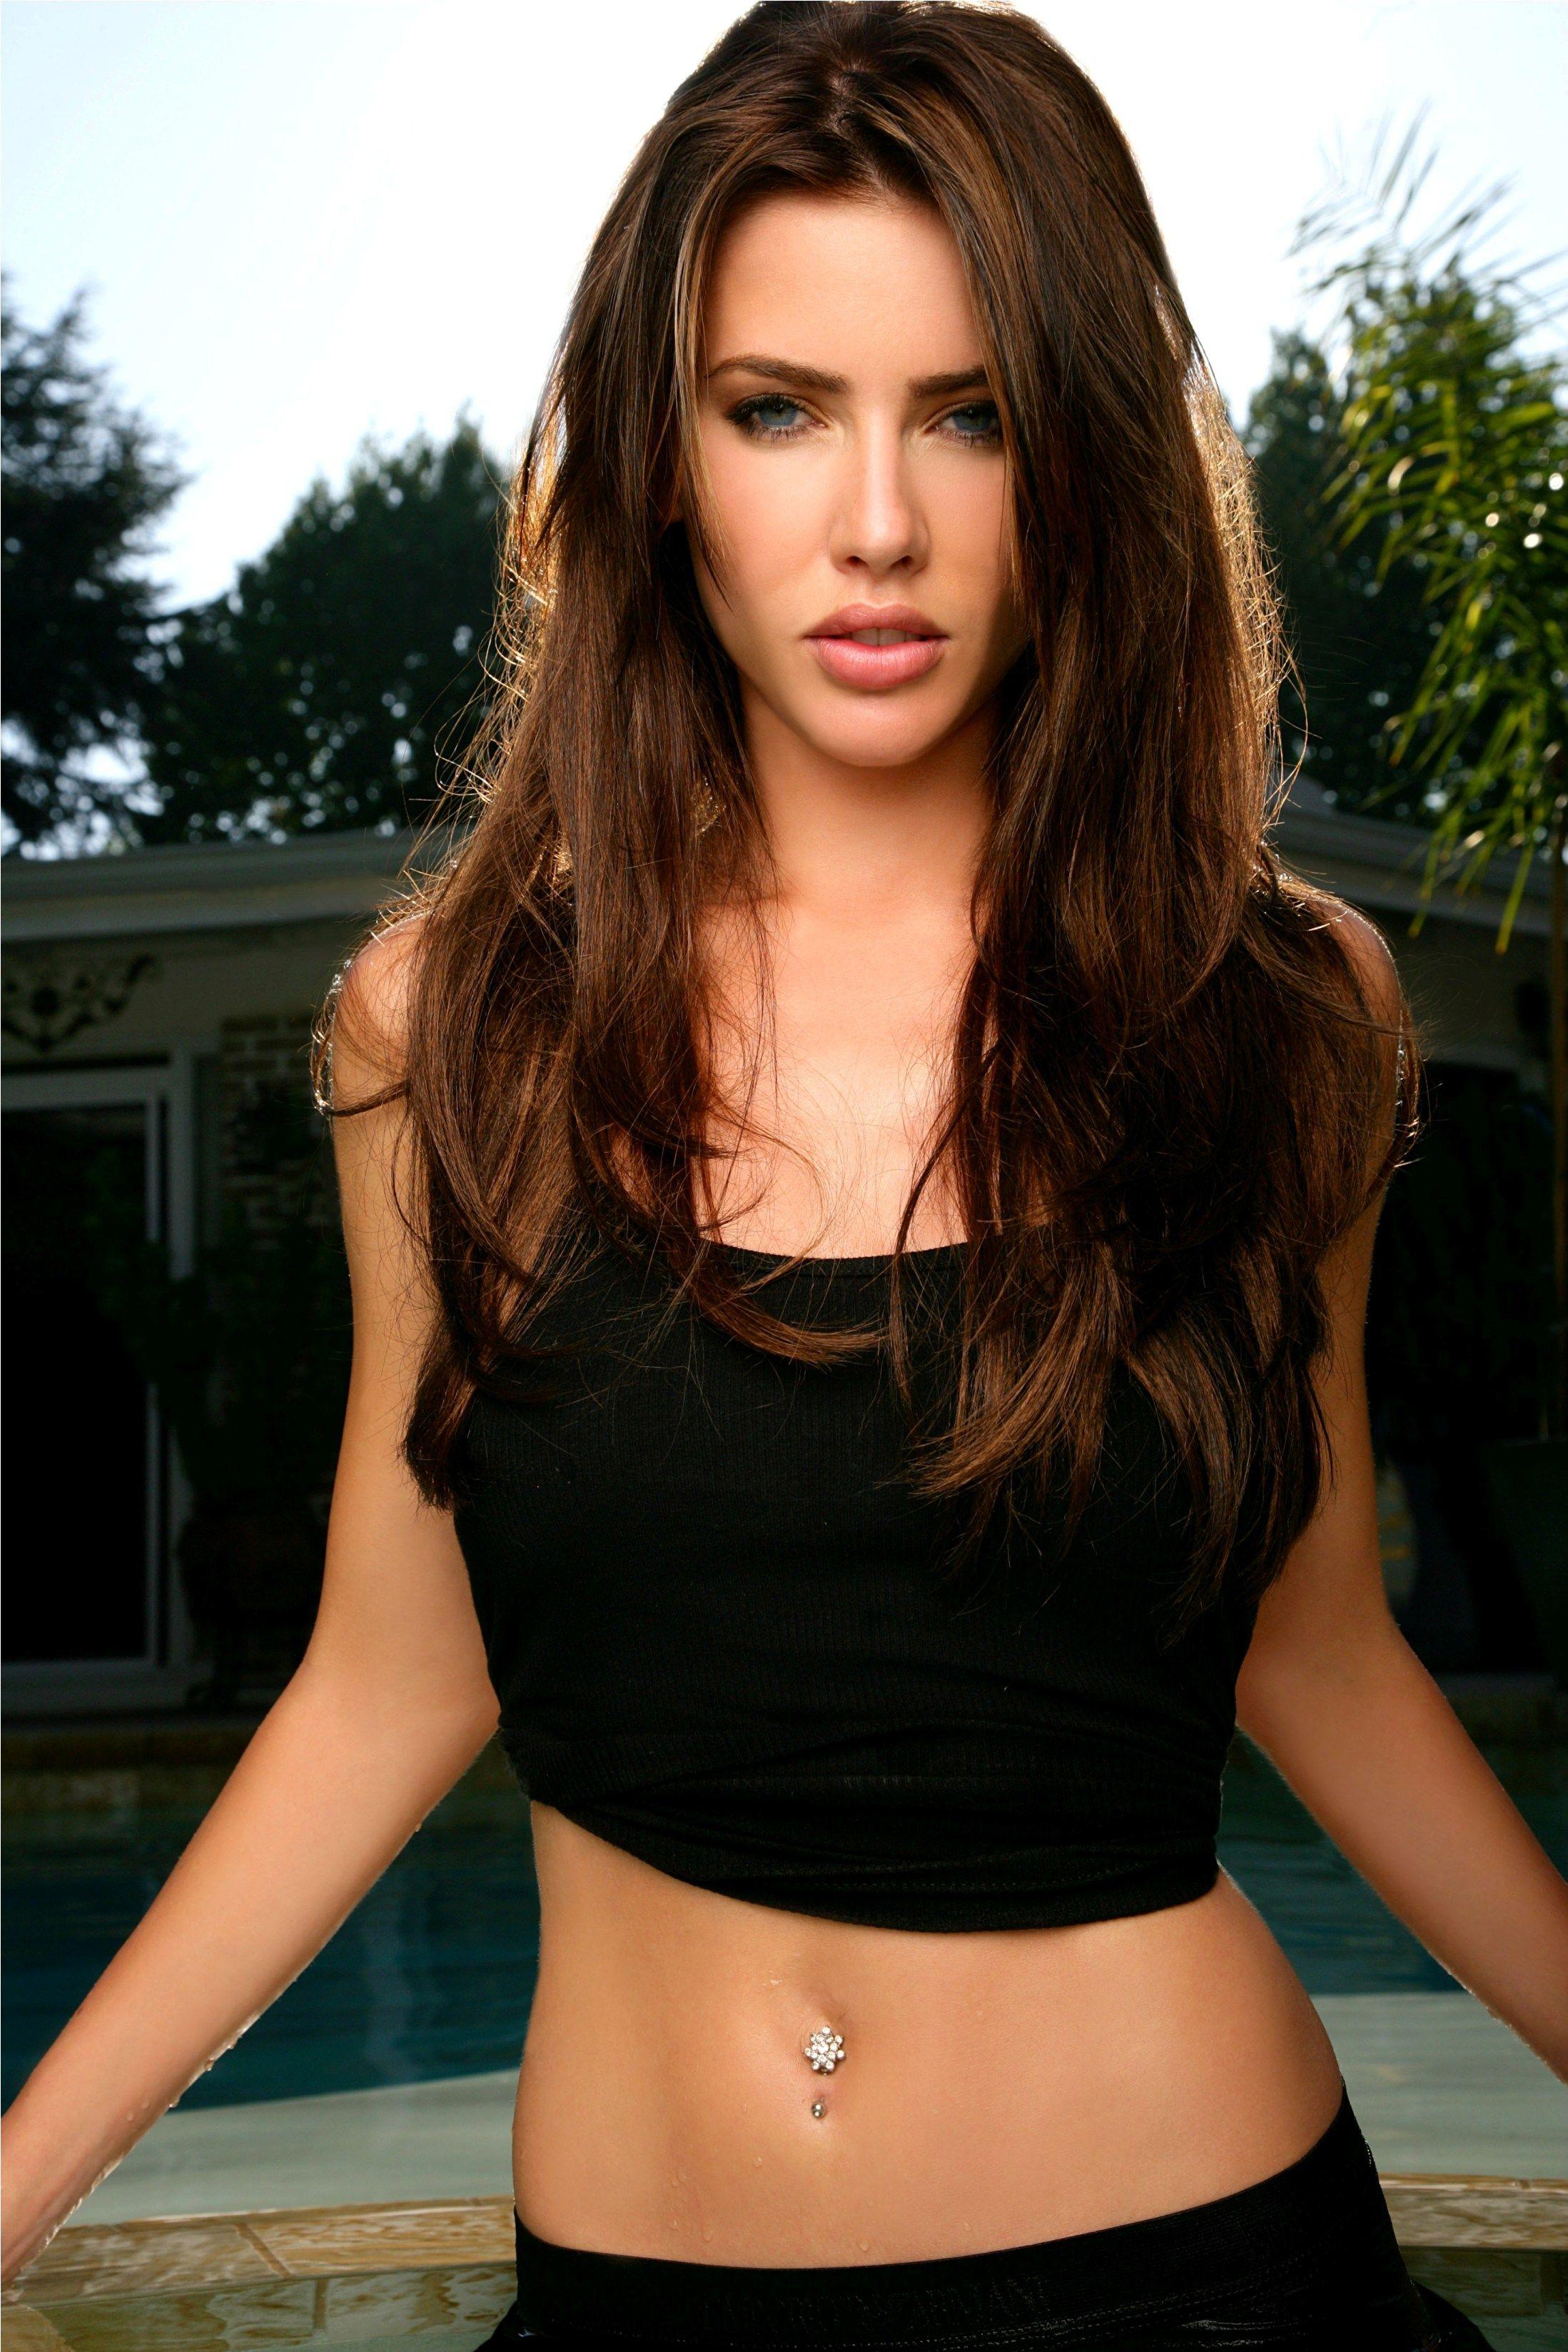 Jacqueline macinnes wood nuda hot pic 158